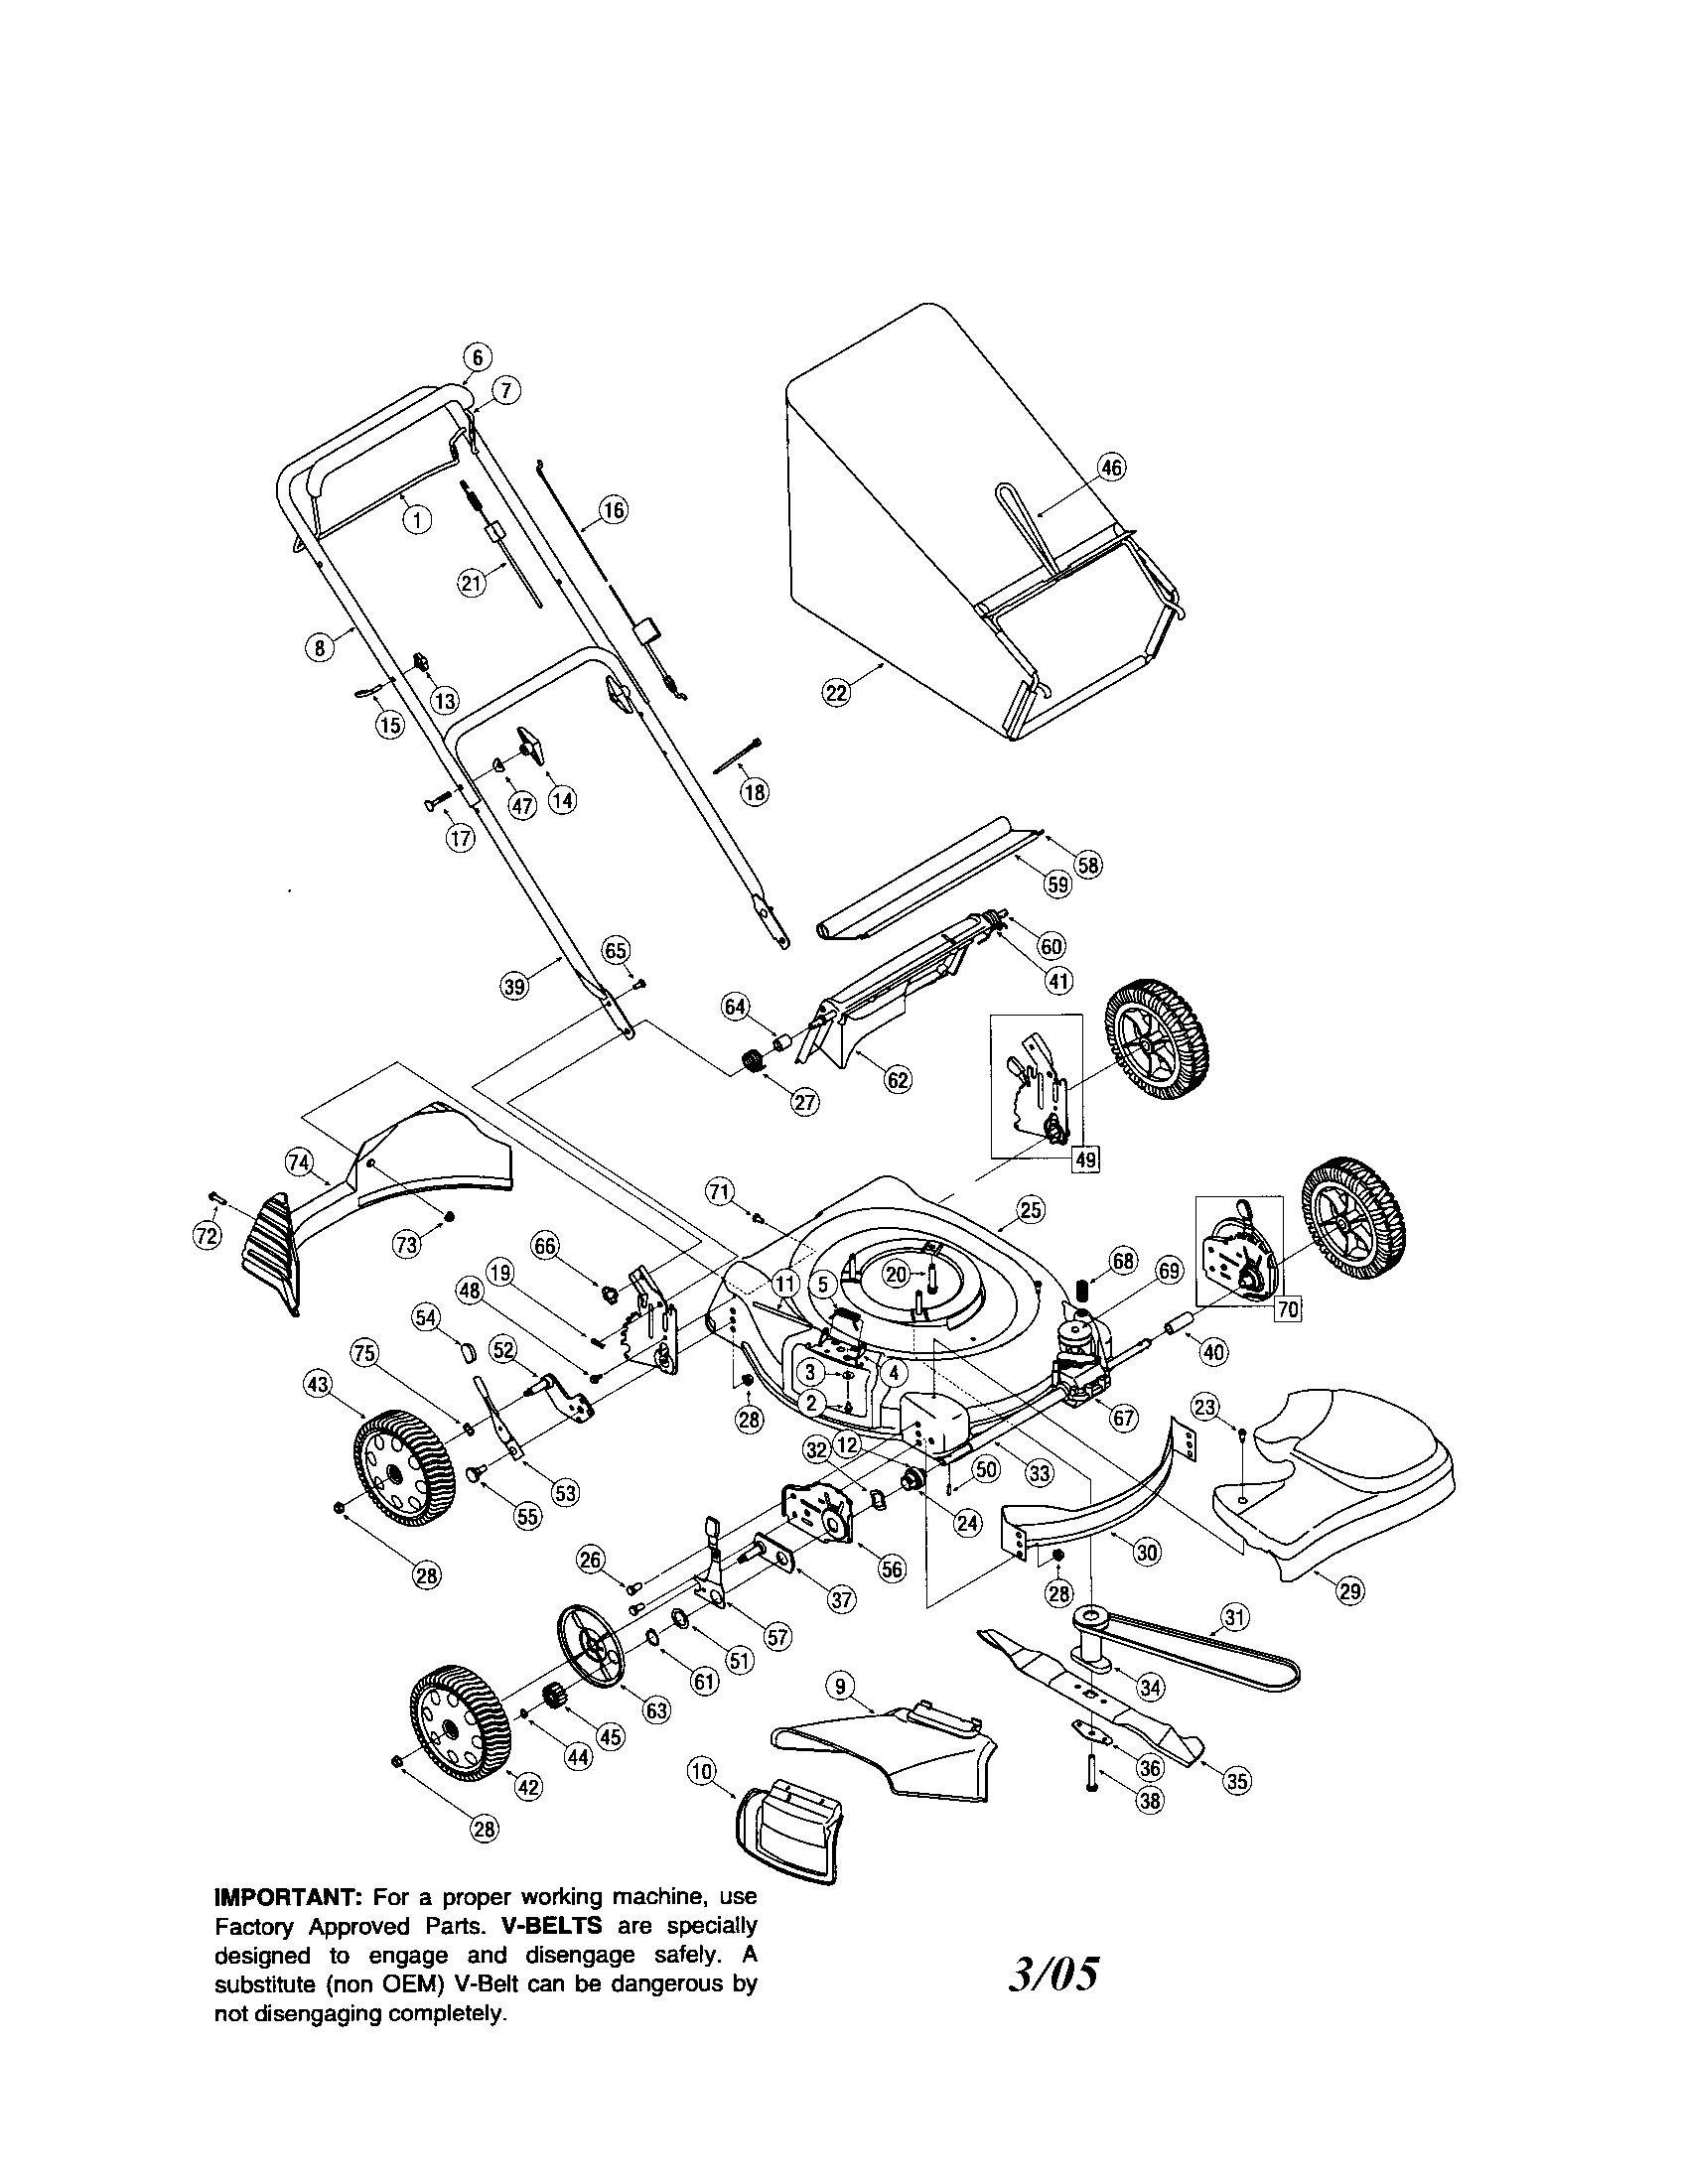 Troybilt lawn mower parts model 12a466a711 sears partsdirect